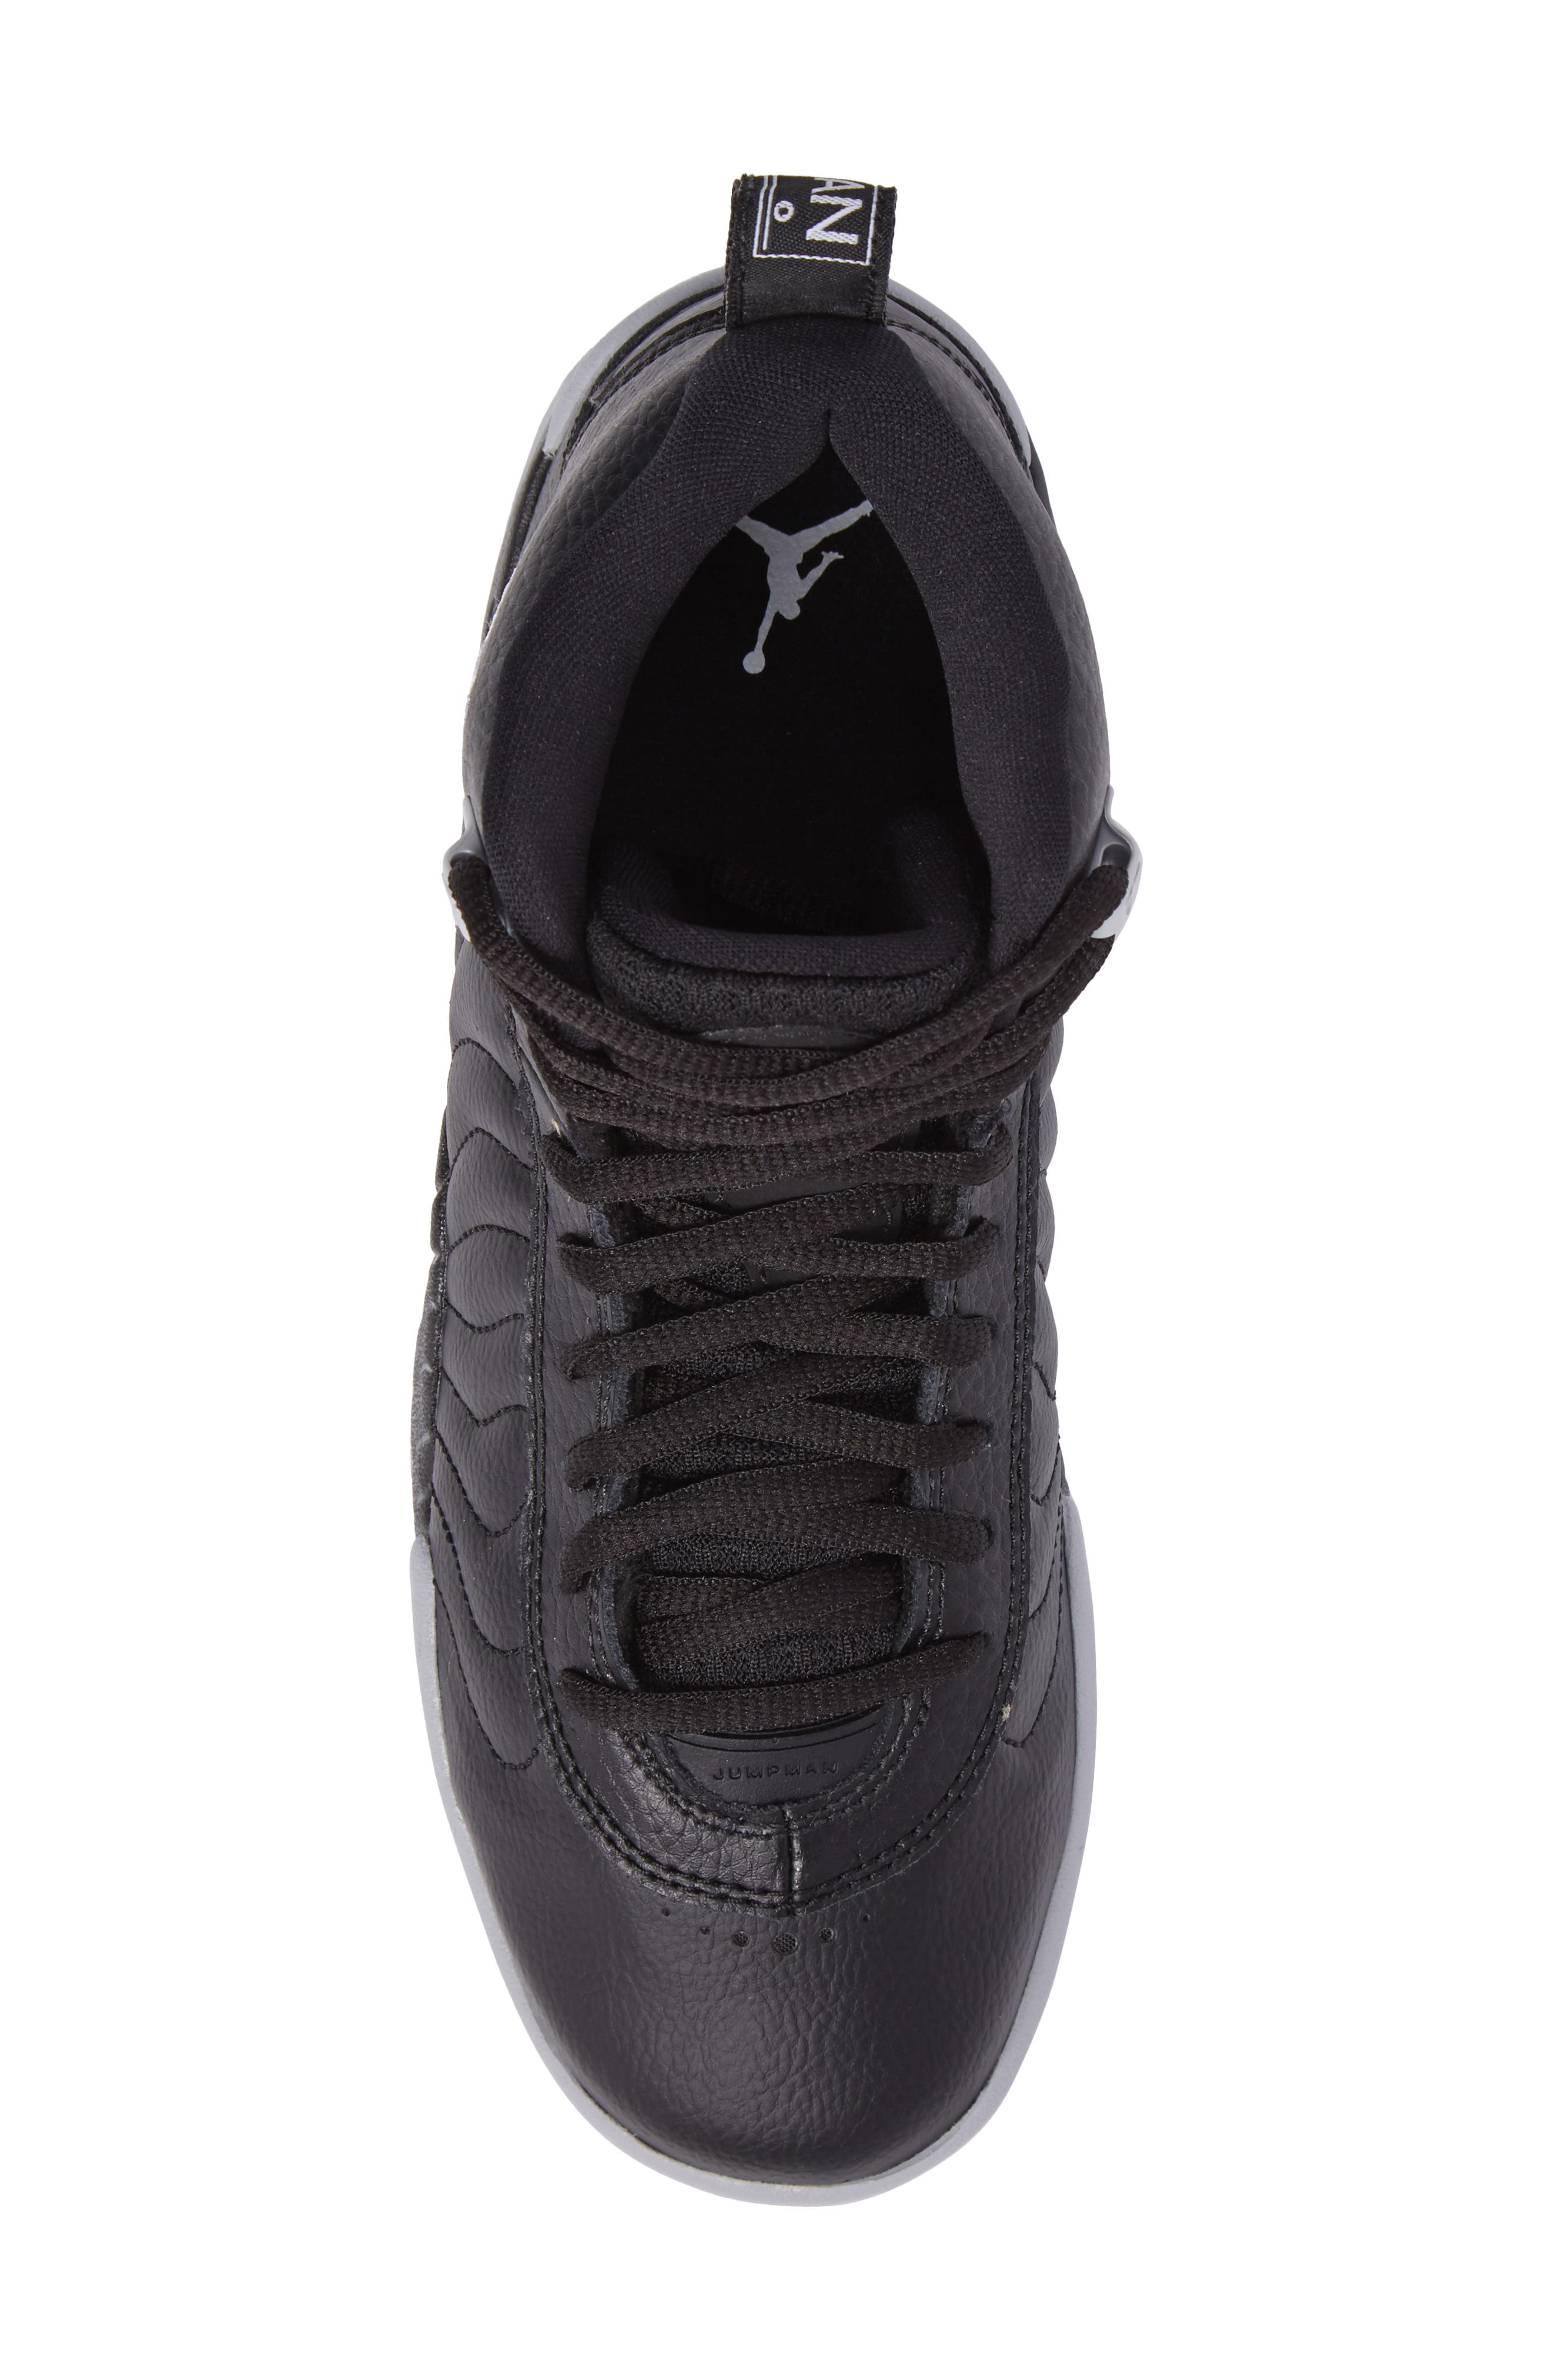 Jumpman Pro BG Mid Top Sneaker,                             Alternate thumbnail 5, color,                             Black/ White-Wolf Grey